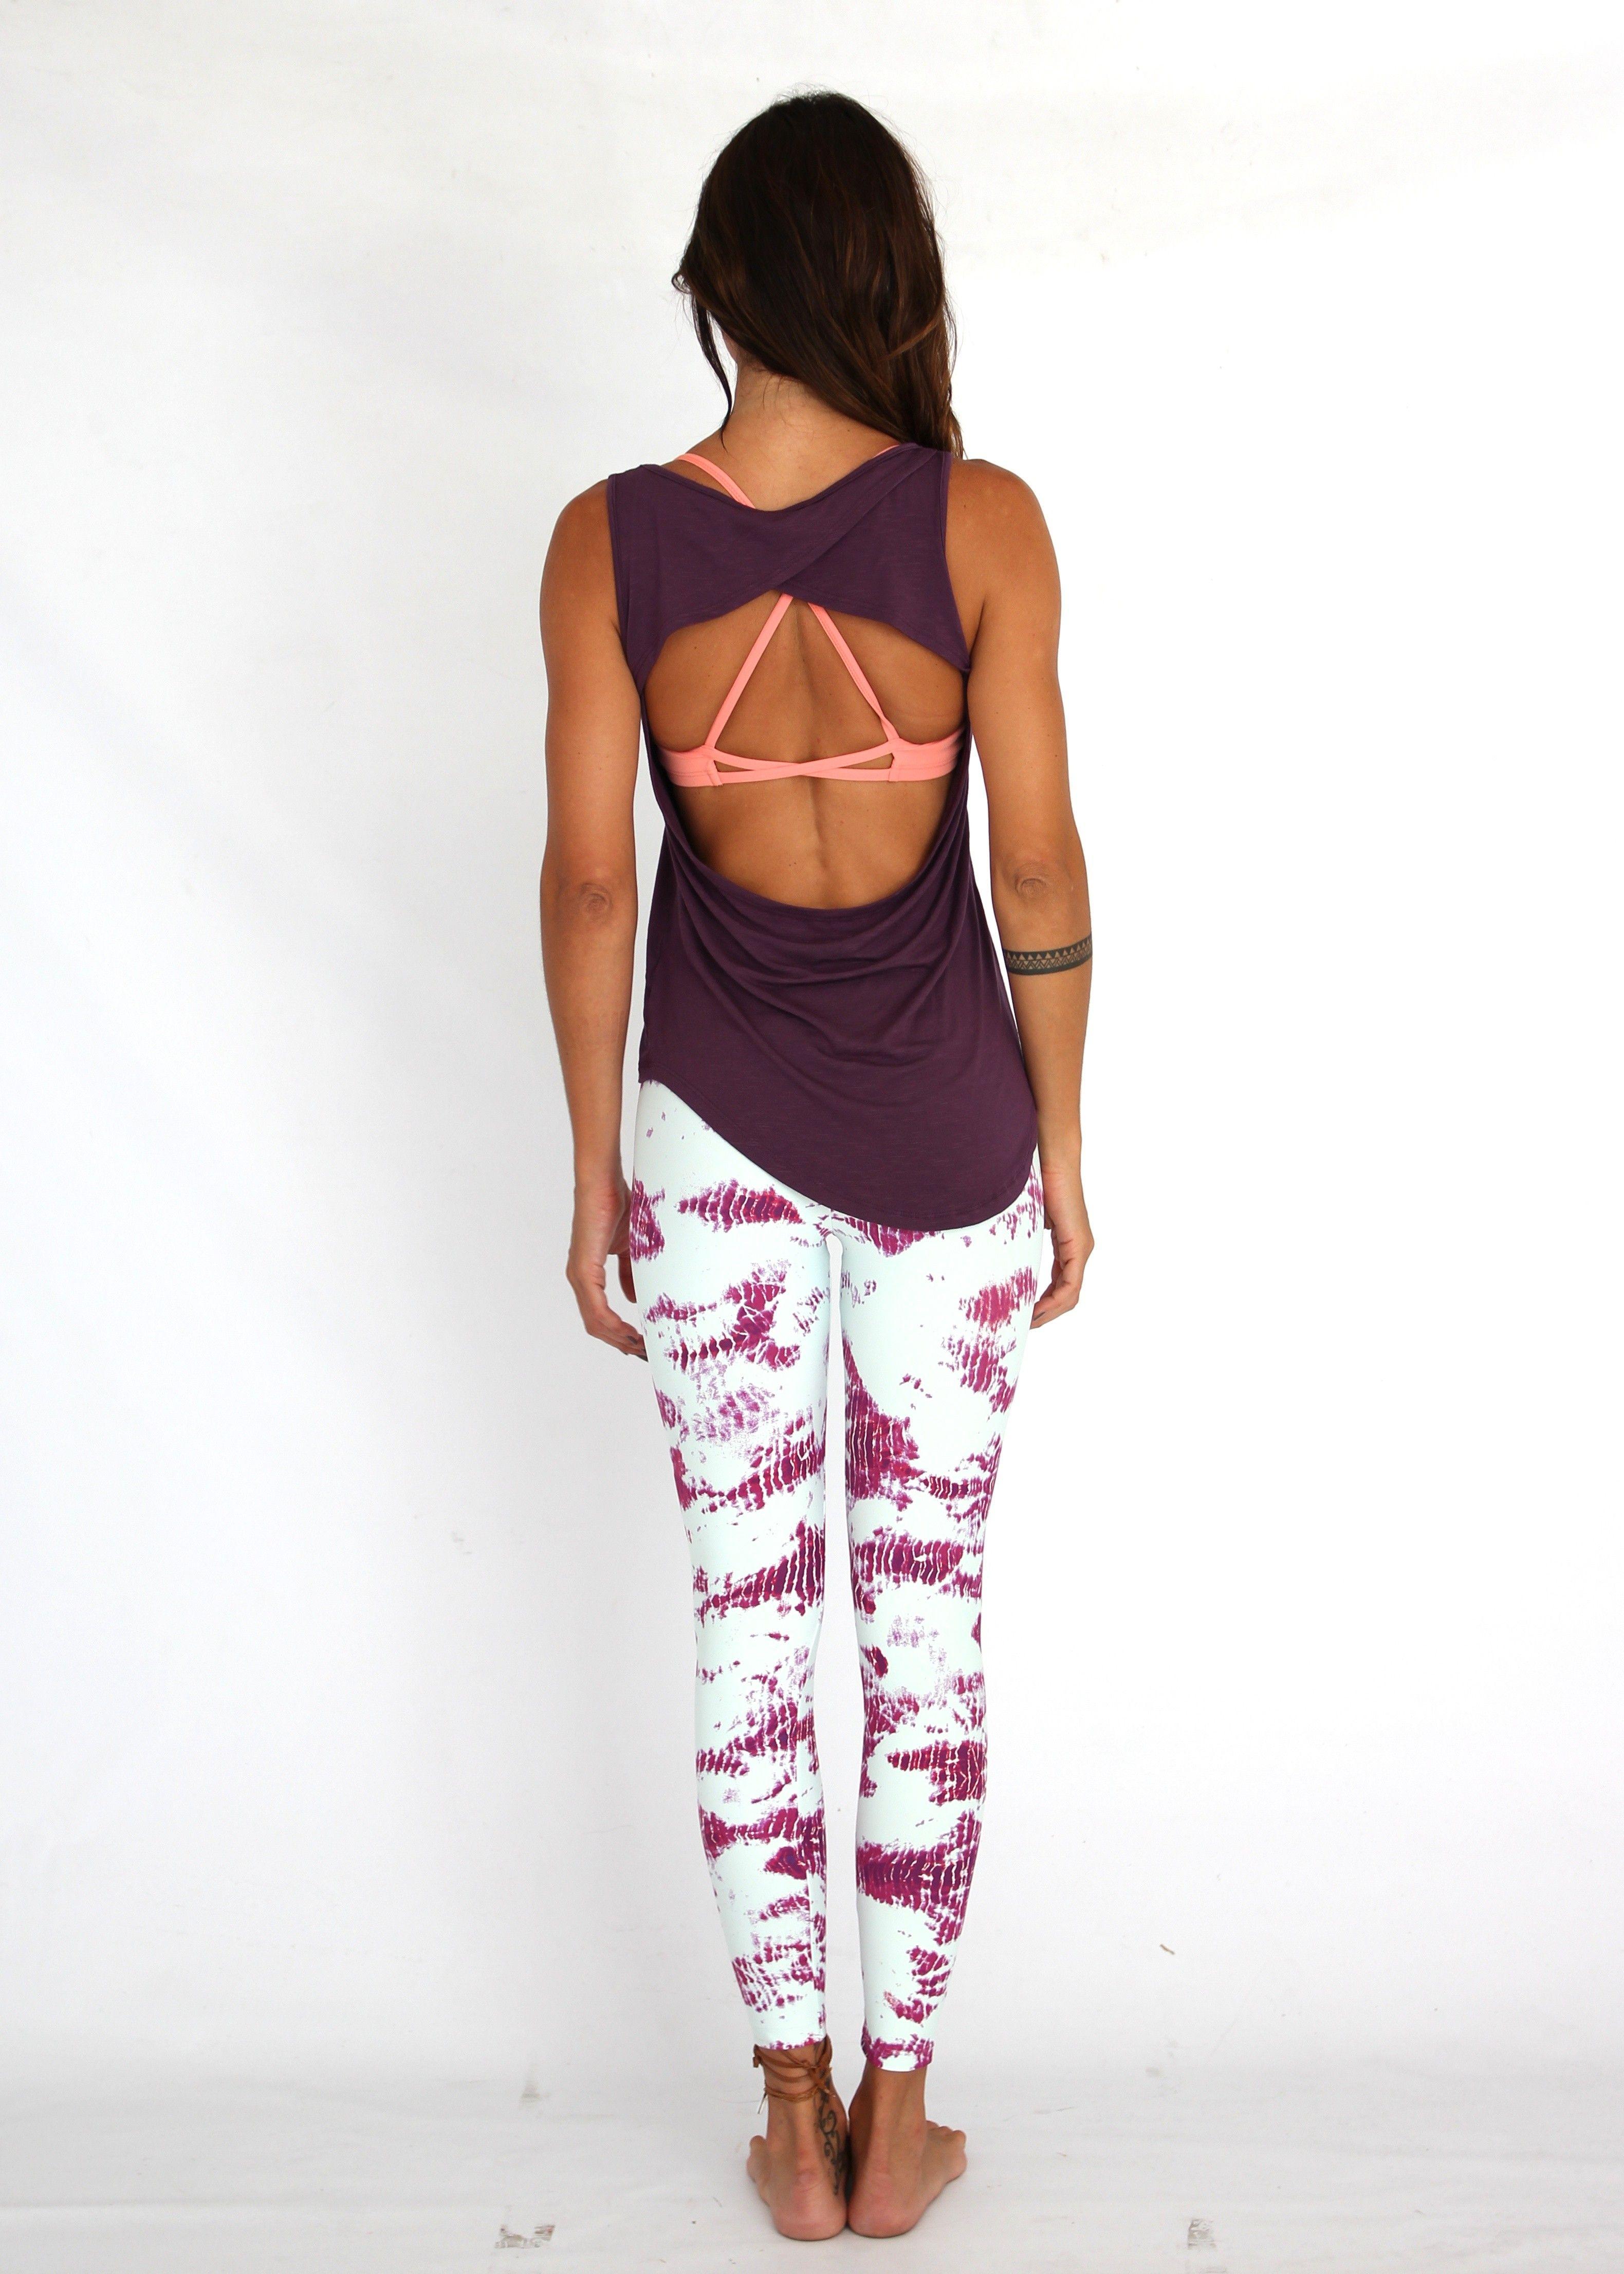 dc28fc5929932 Lean On Me Tank by Tiffany Cruikshank - Wine Workout Clothes for Women |  SHOP @ FitnessApparelExpress.com